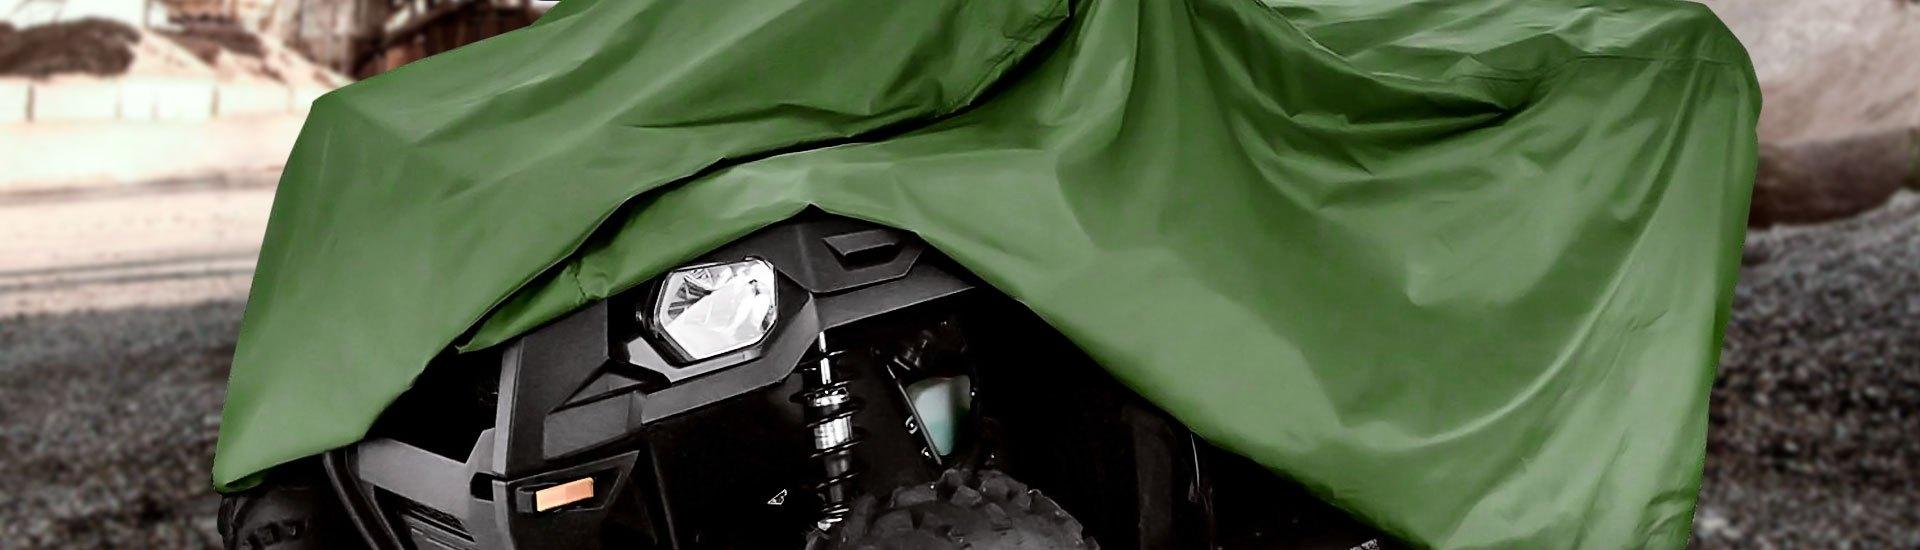 Enjoyable Yamaha Atv Covers Waterproof Dust Outdoor Heavy Duty Beatyapartments Chair Design Images Beatyapartmentscom